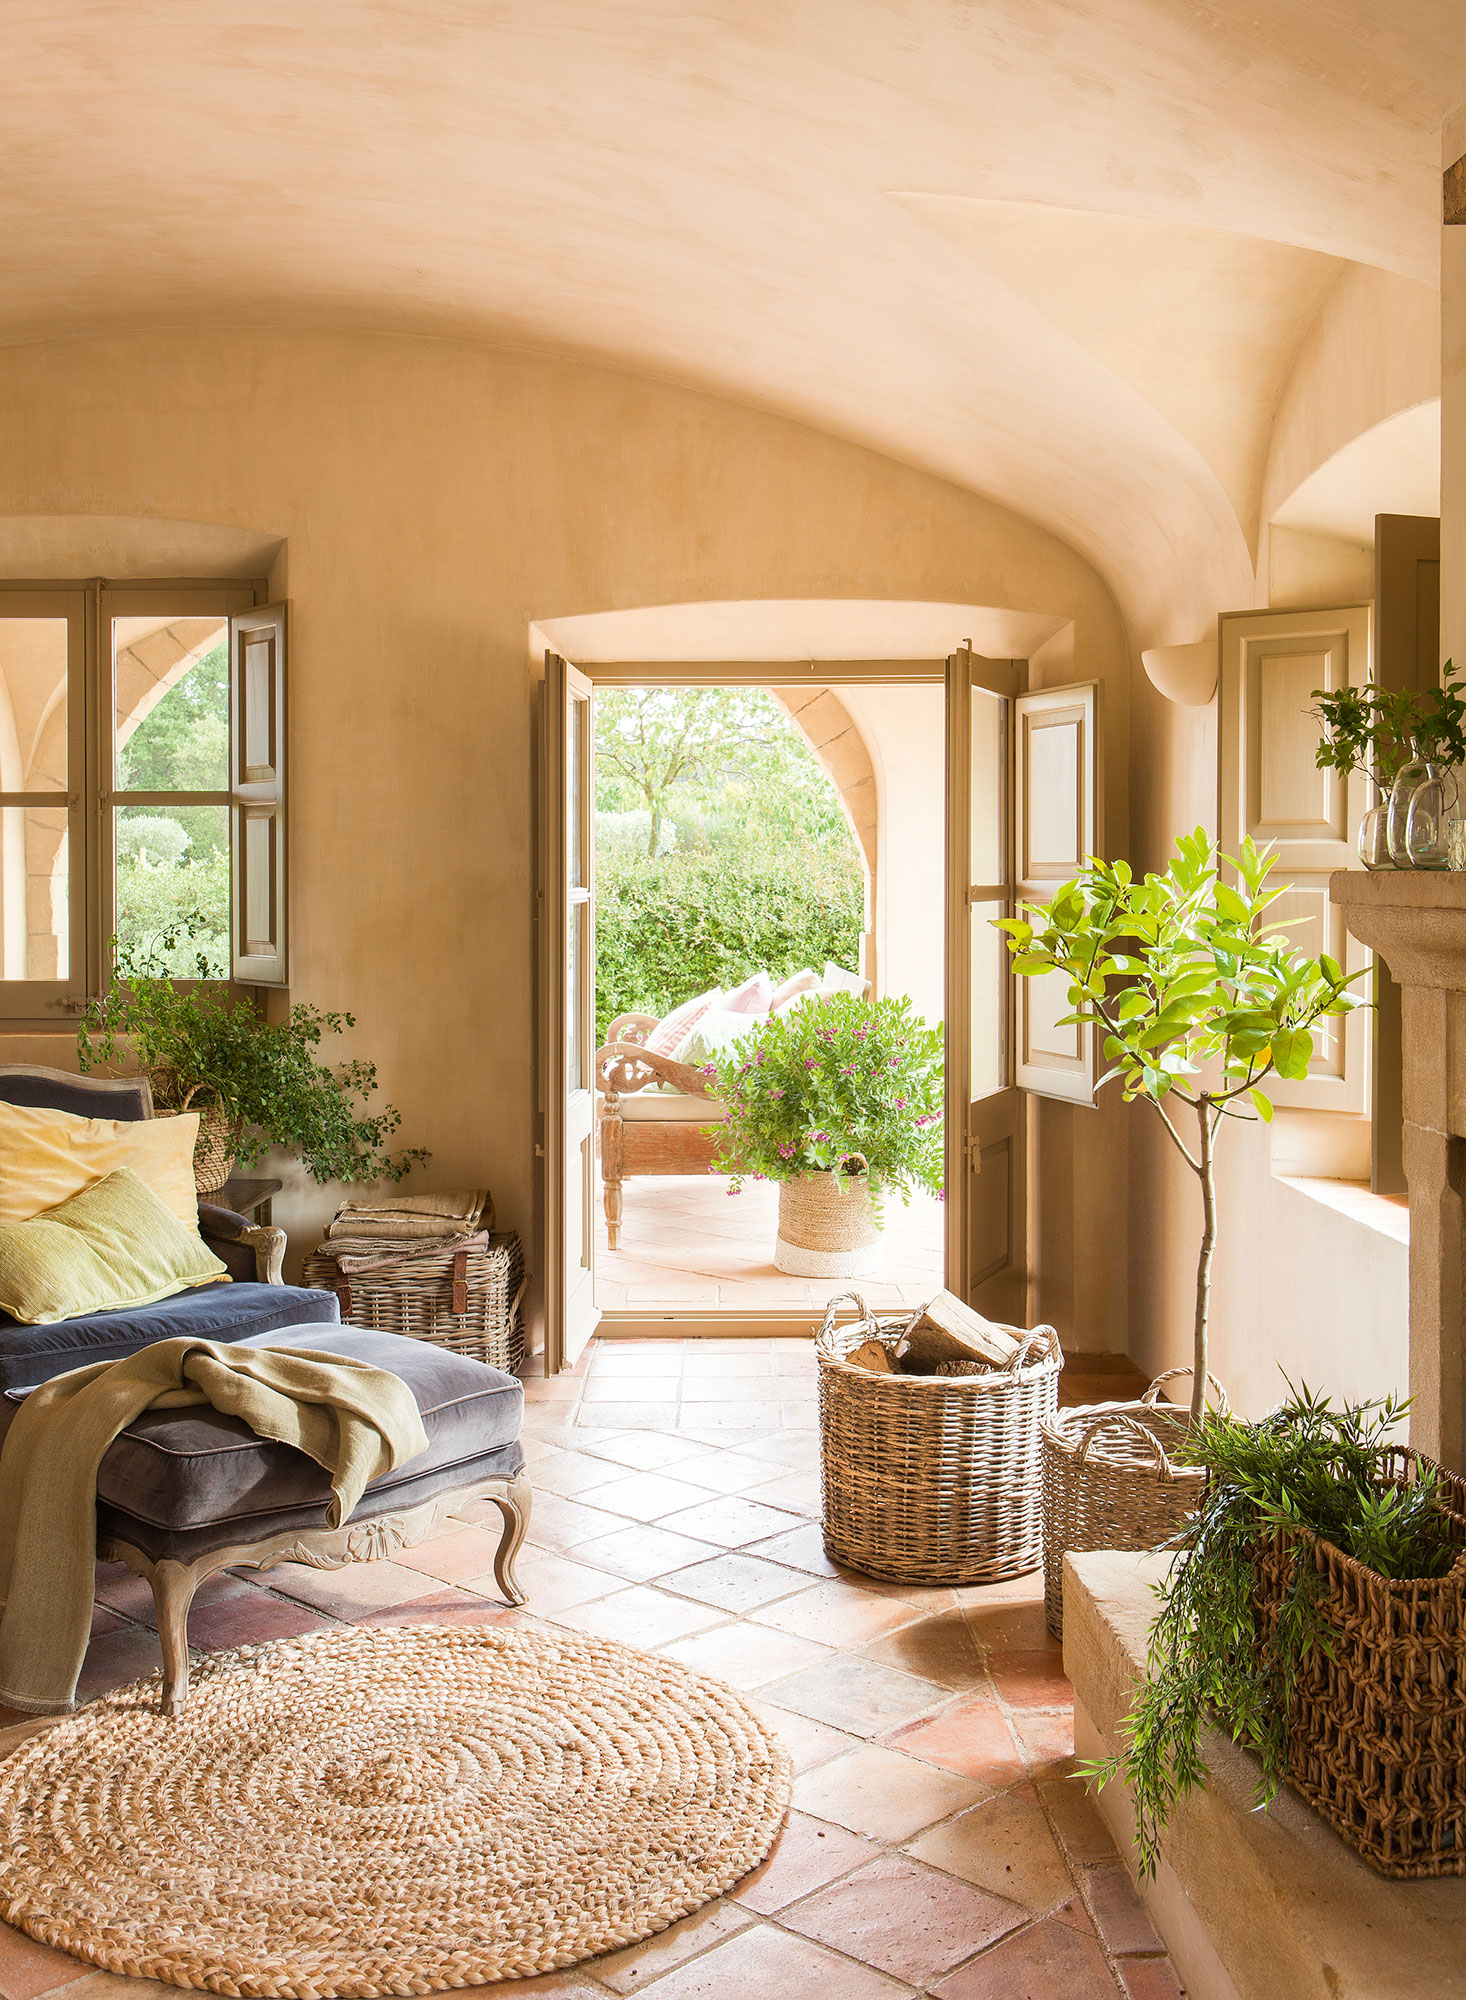 Decorar con cestos est de moda for Casas decoradas con plantas naturales